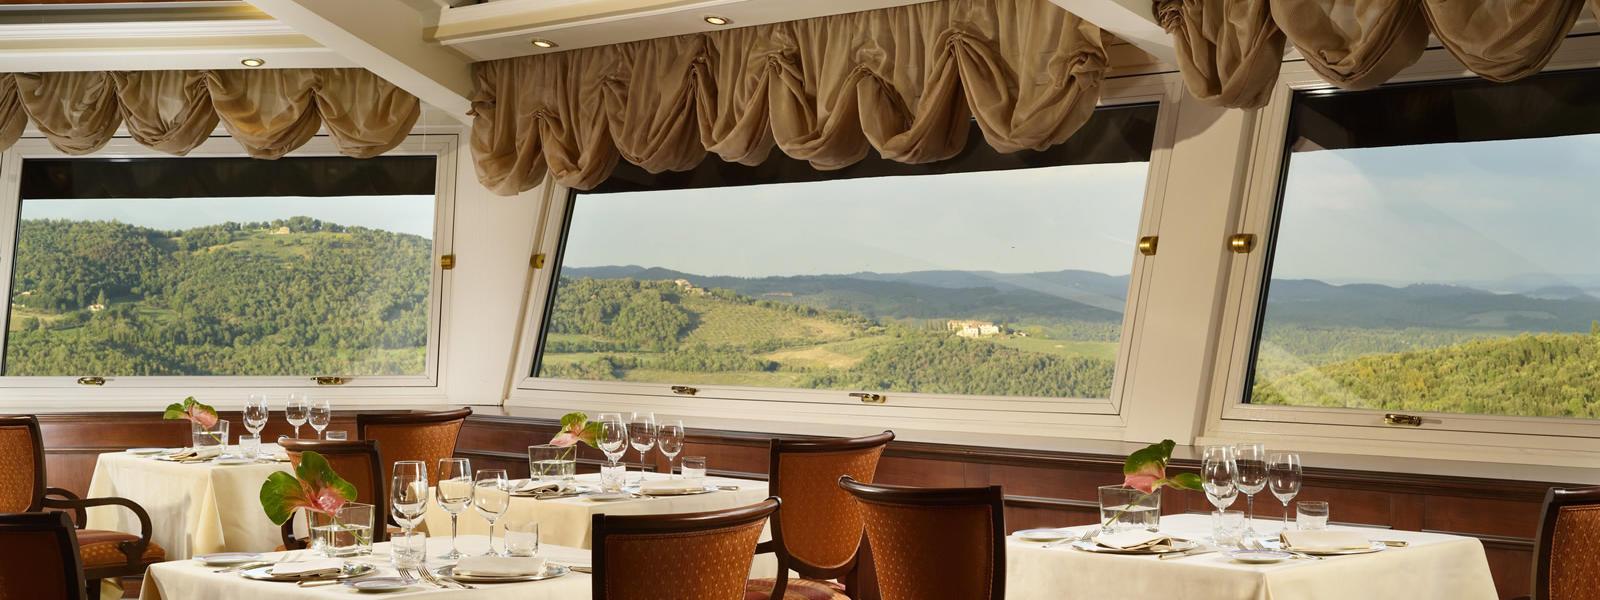 Petriolo SPA Resort | UNA Esperienze